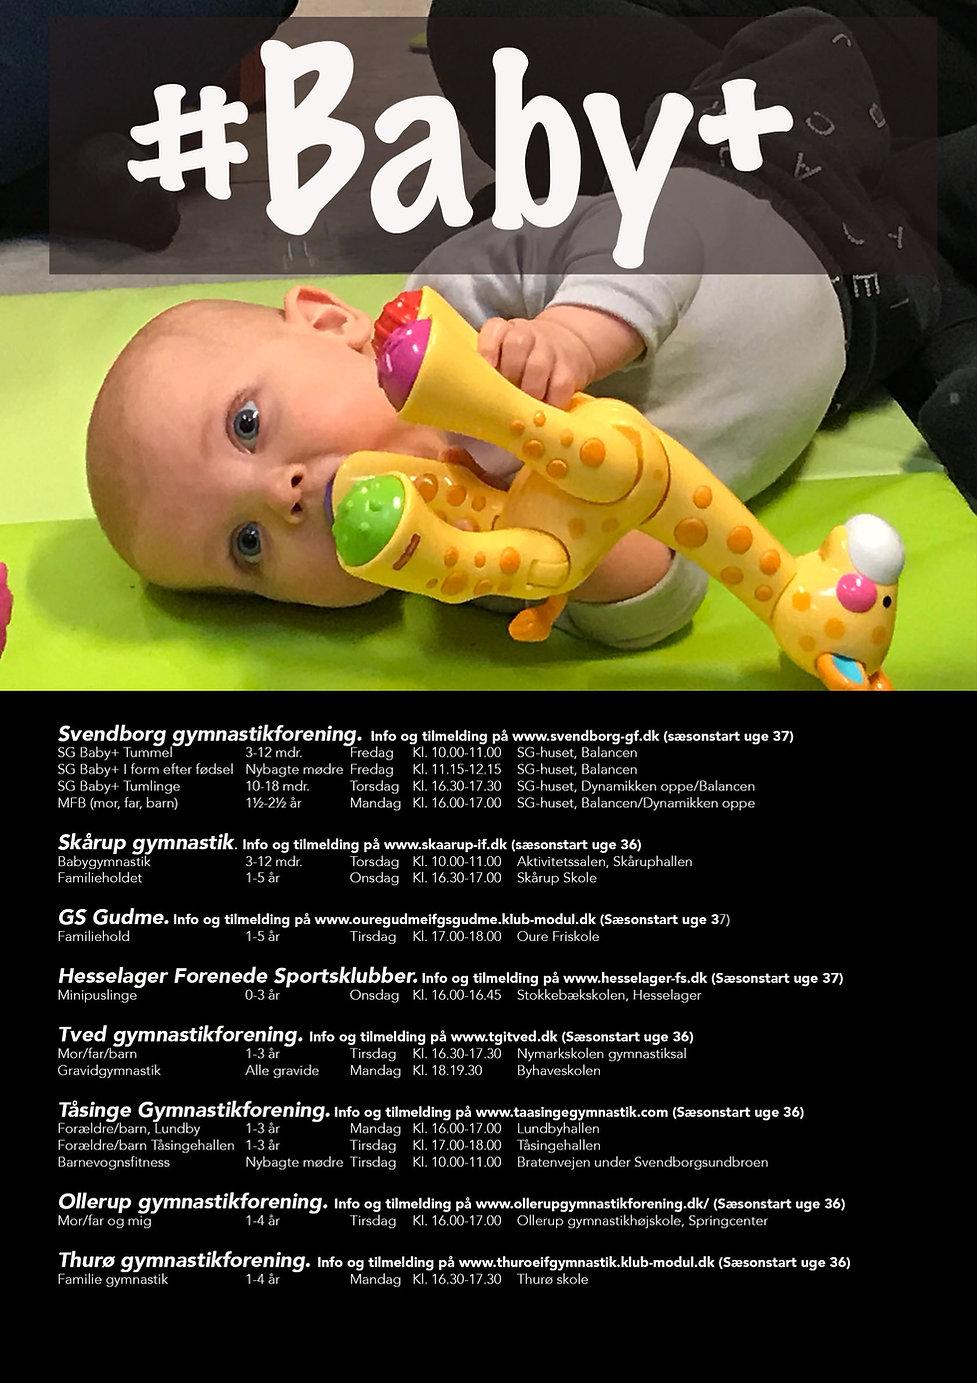 18.08.29 Baby+ plakat-final.jpg